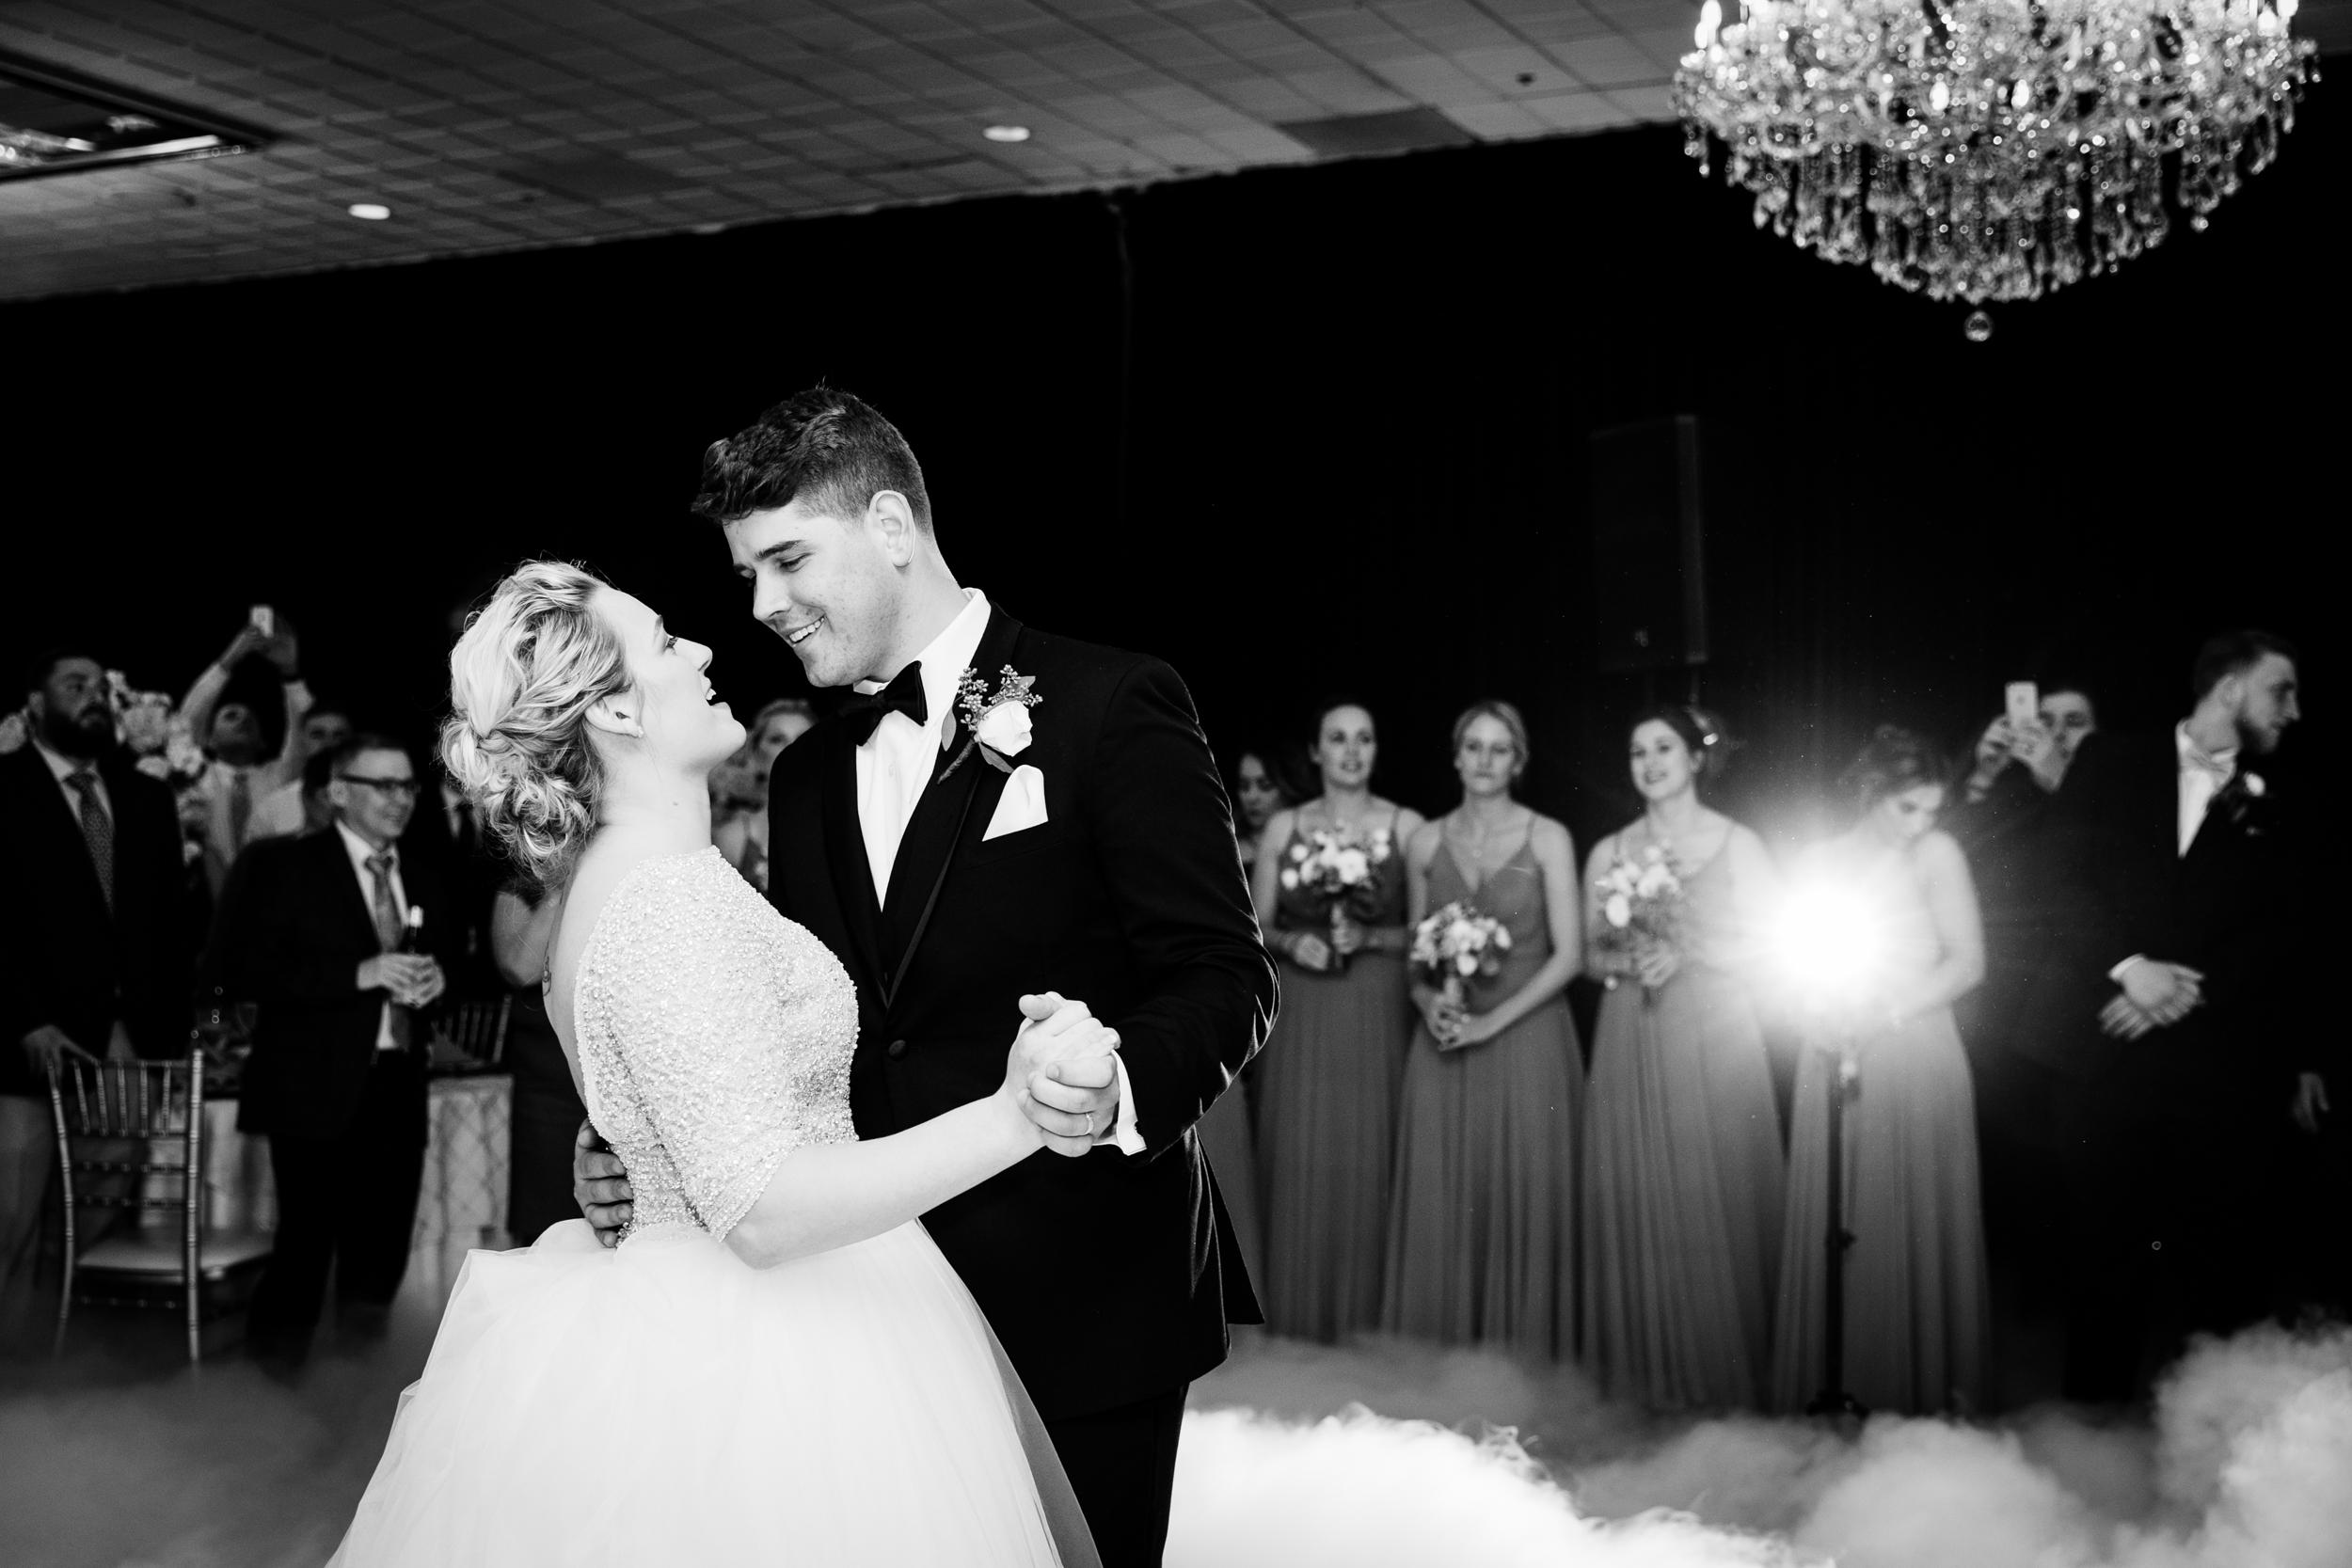 CELEBRATIONS BENSALEM WEDDING PHOTOGRAPHY-80.jpg